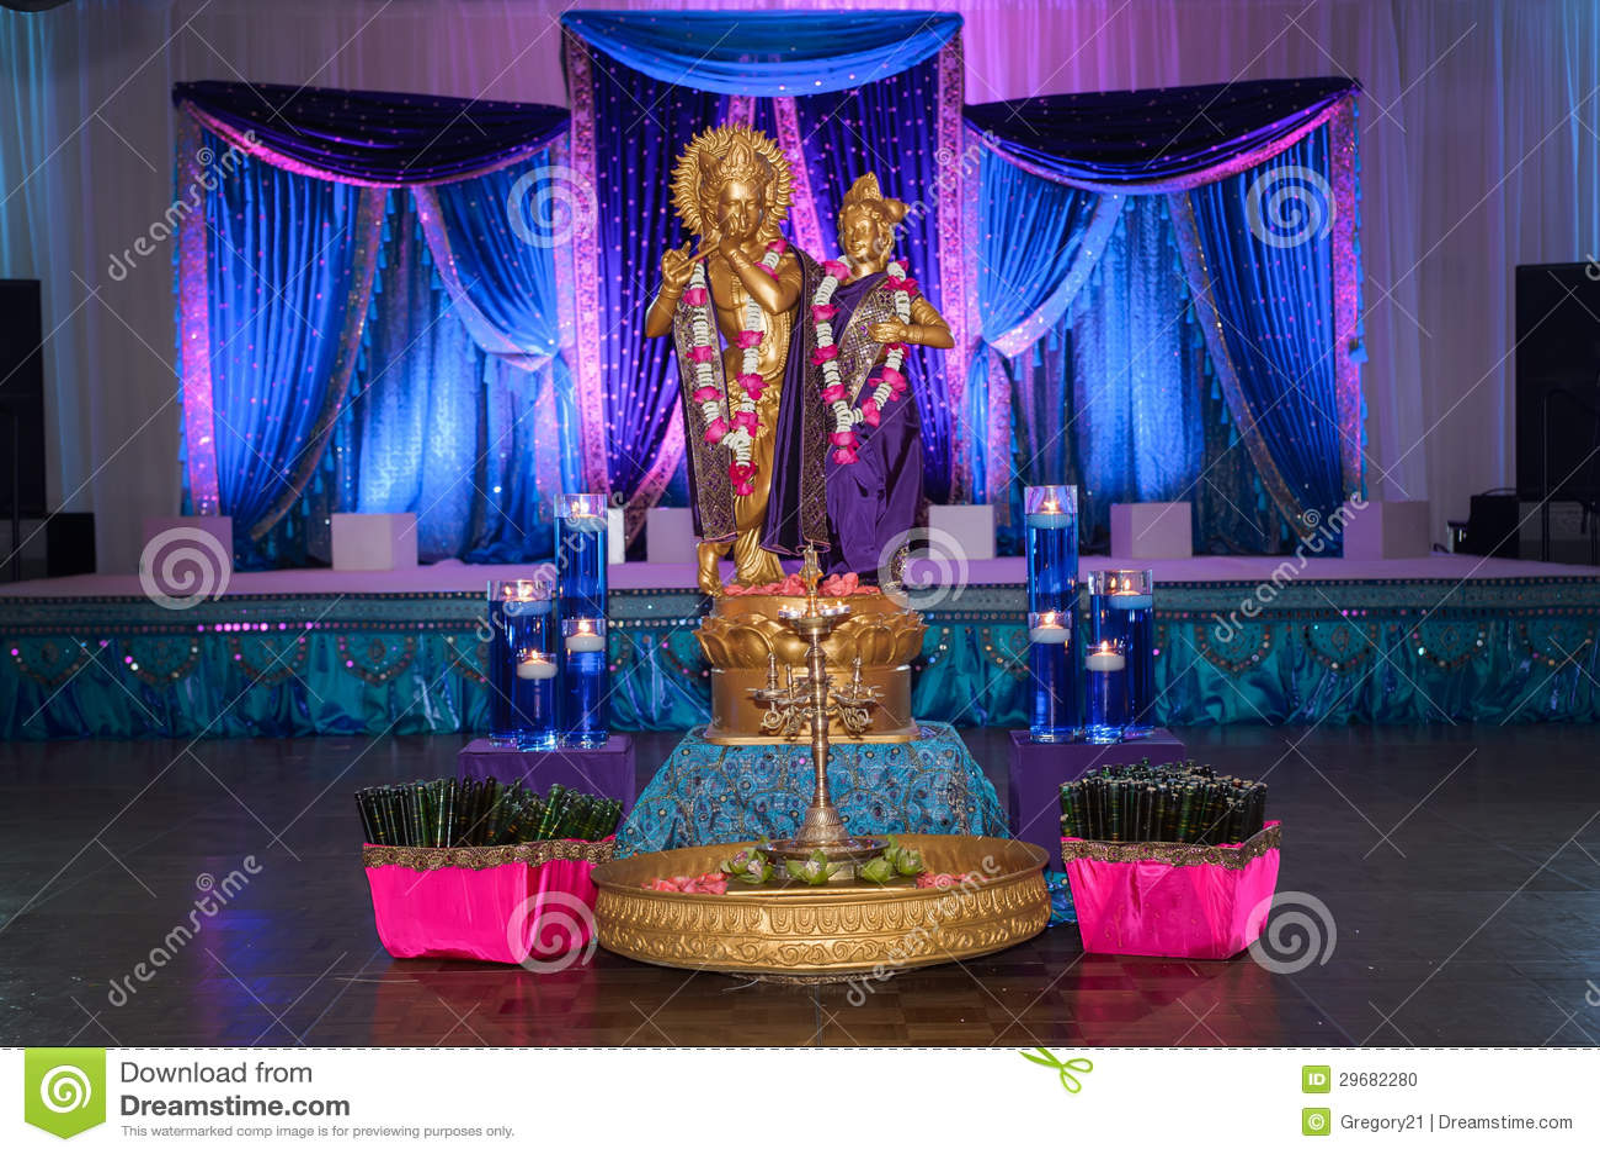 Indian Wedding Decor Stock Photo Image Of Culture Asian 29682280